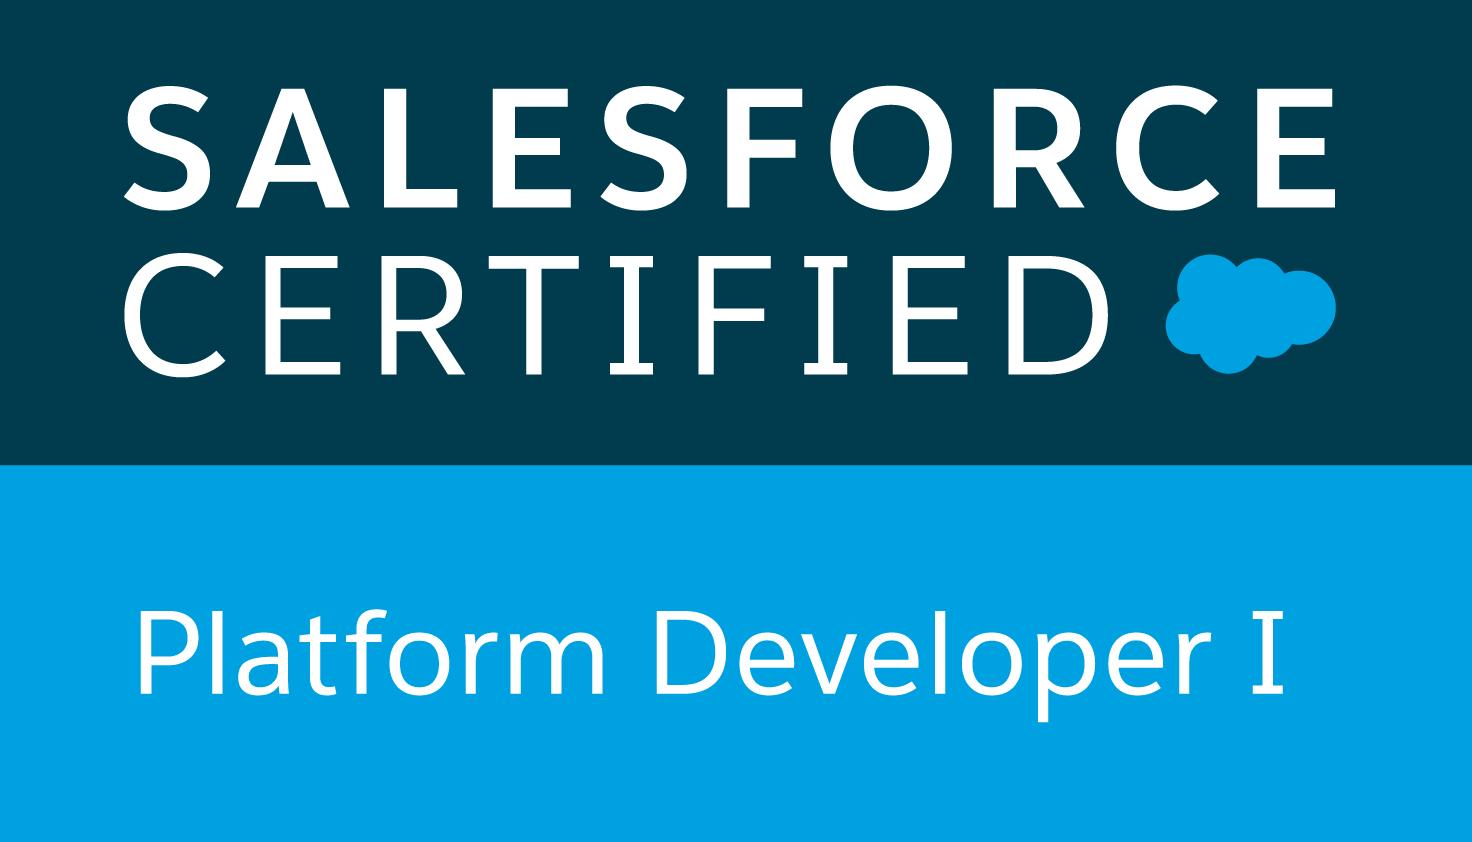 SFDC Certificate